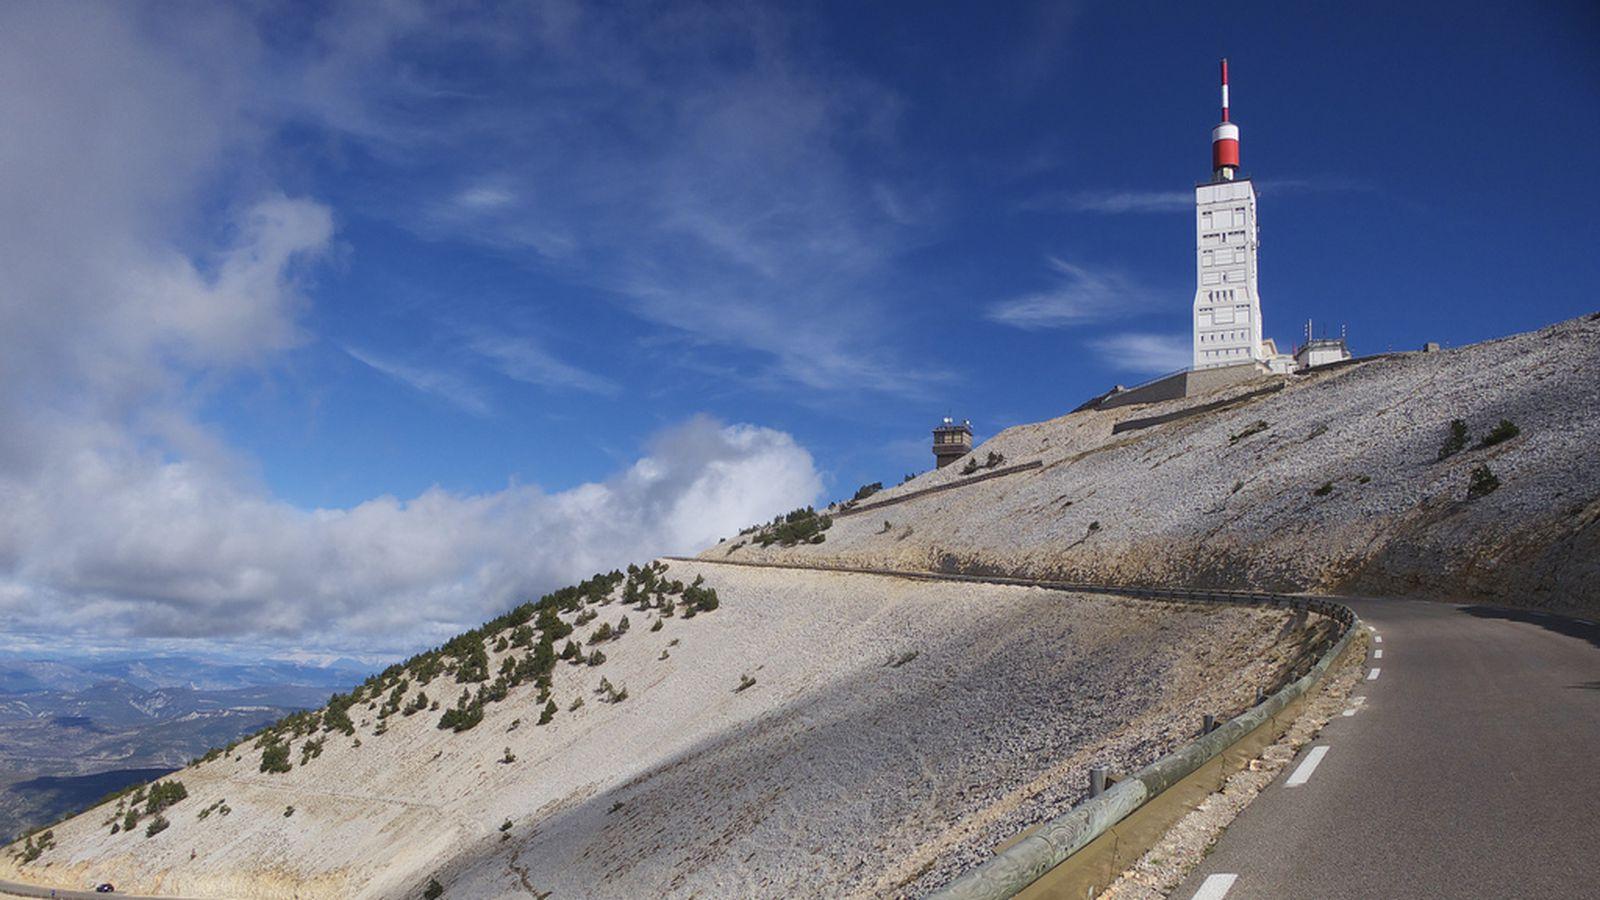 2013 Tour de France Mountains Preview